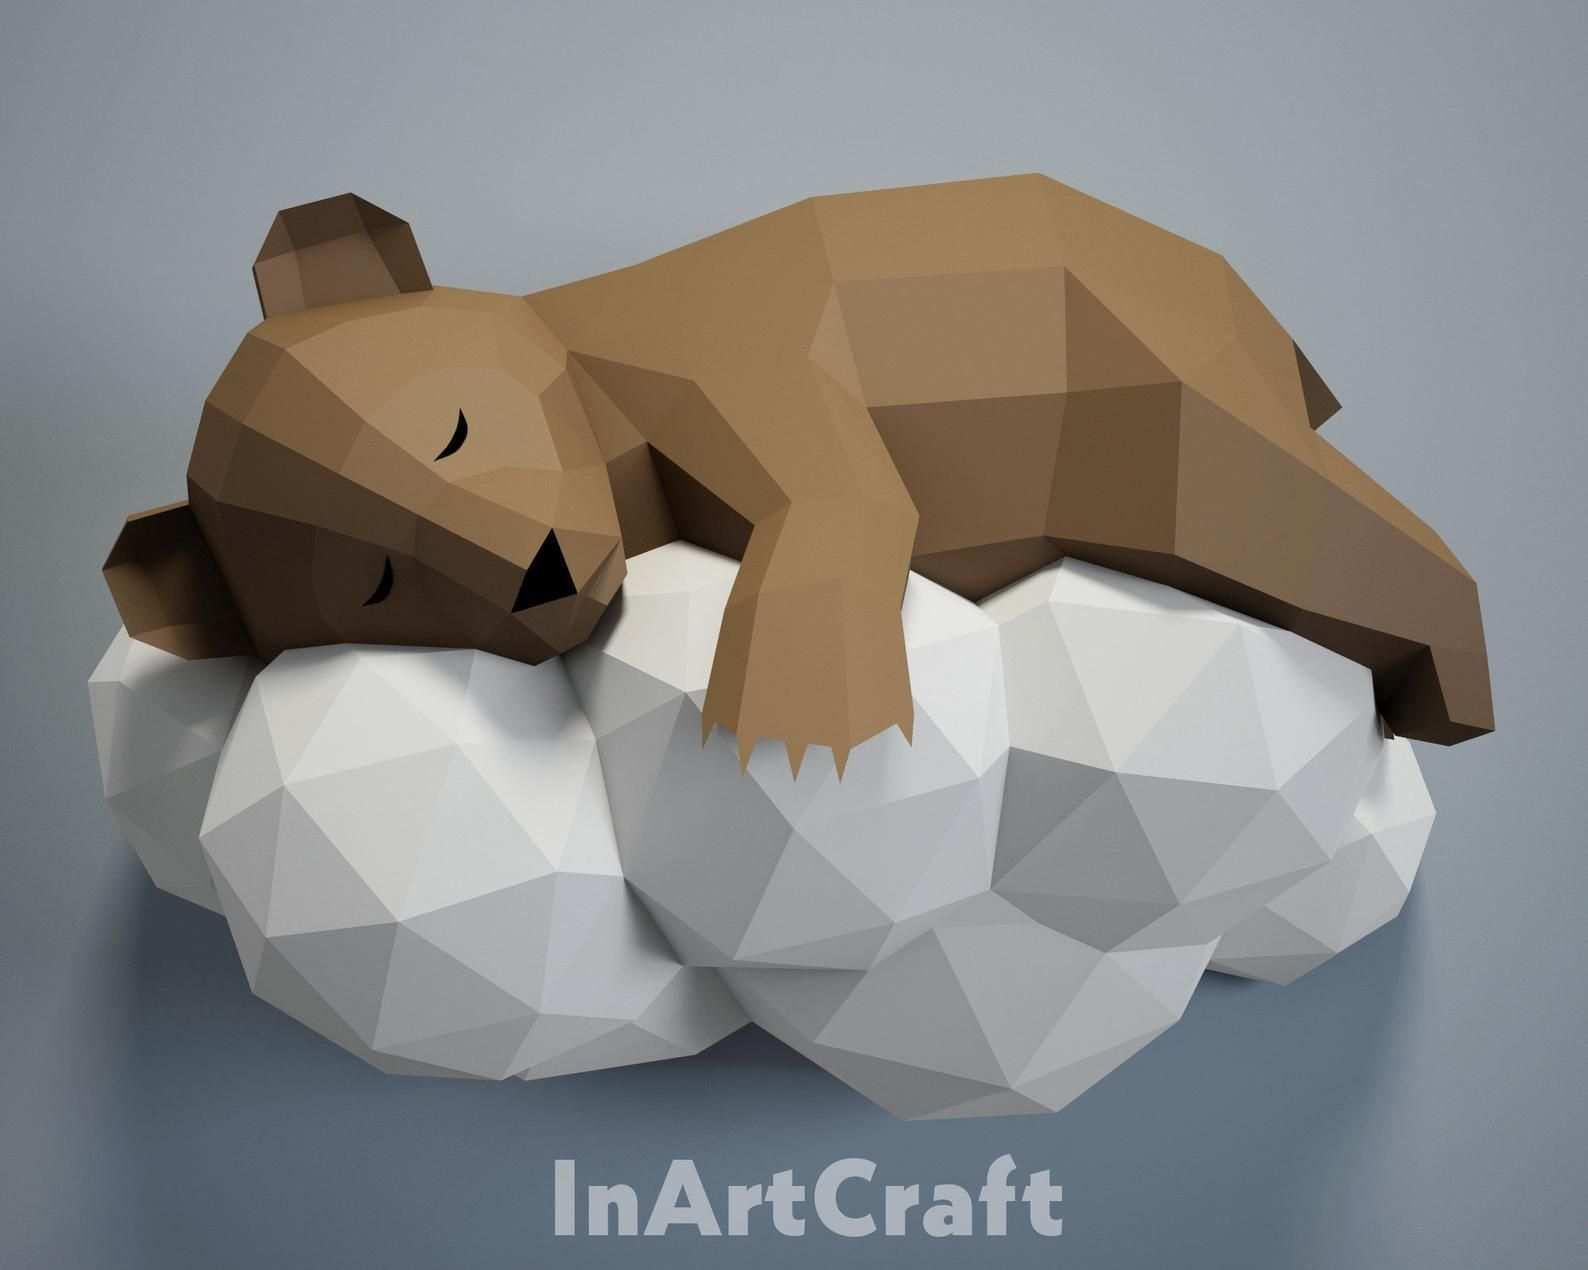 Pdf Papercraft Bar Auf Einer Wolke Papier Handwerk 3d Origami Etsy Paper Sculpture Papercraft Templates 3d Paper Crafts